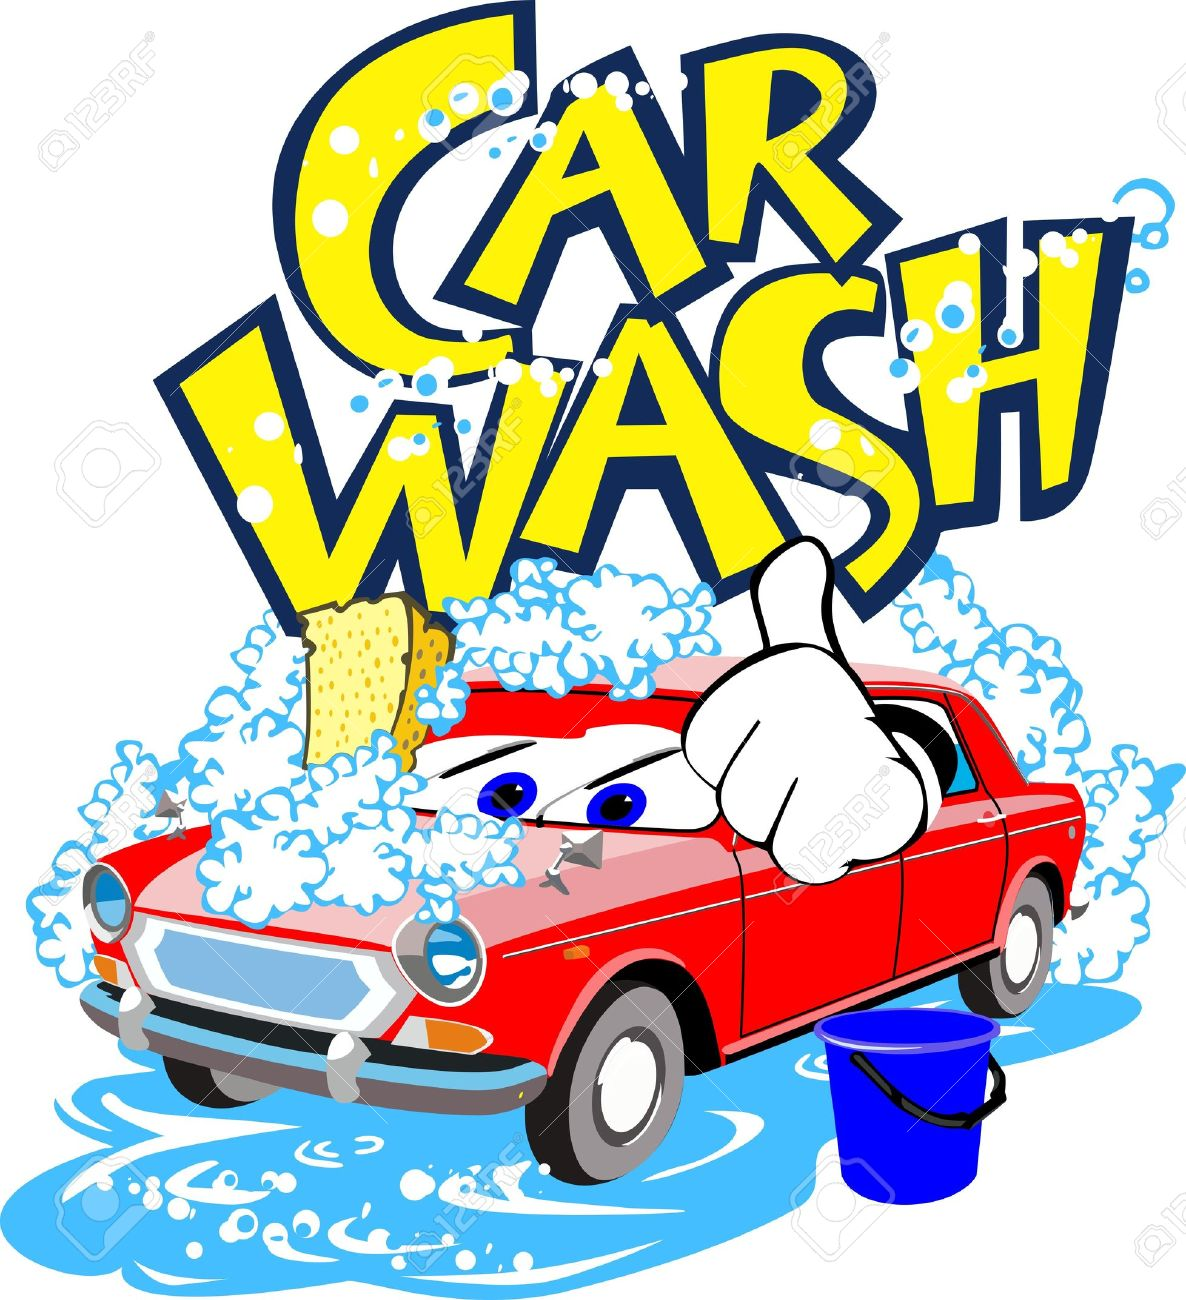 car wash royalty free cliparts vectors and stock illustration rh 123rf com car wash vector free car wash victorville